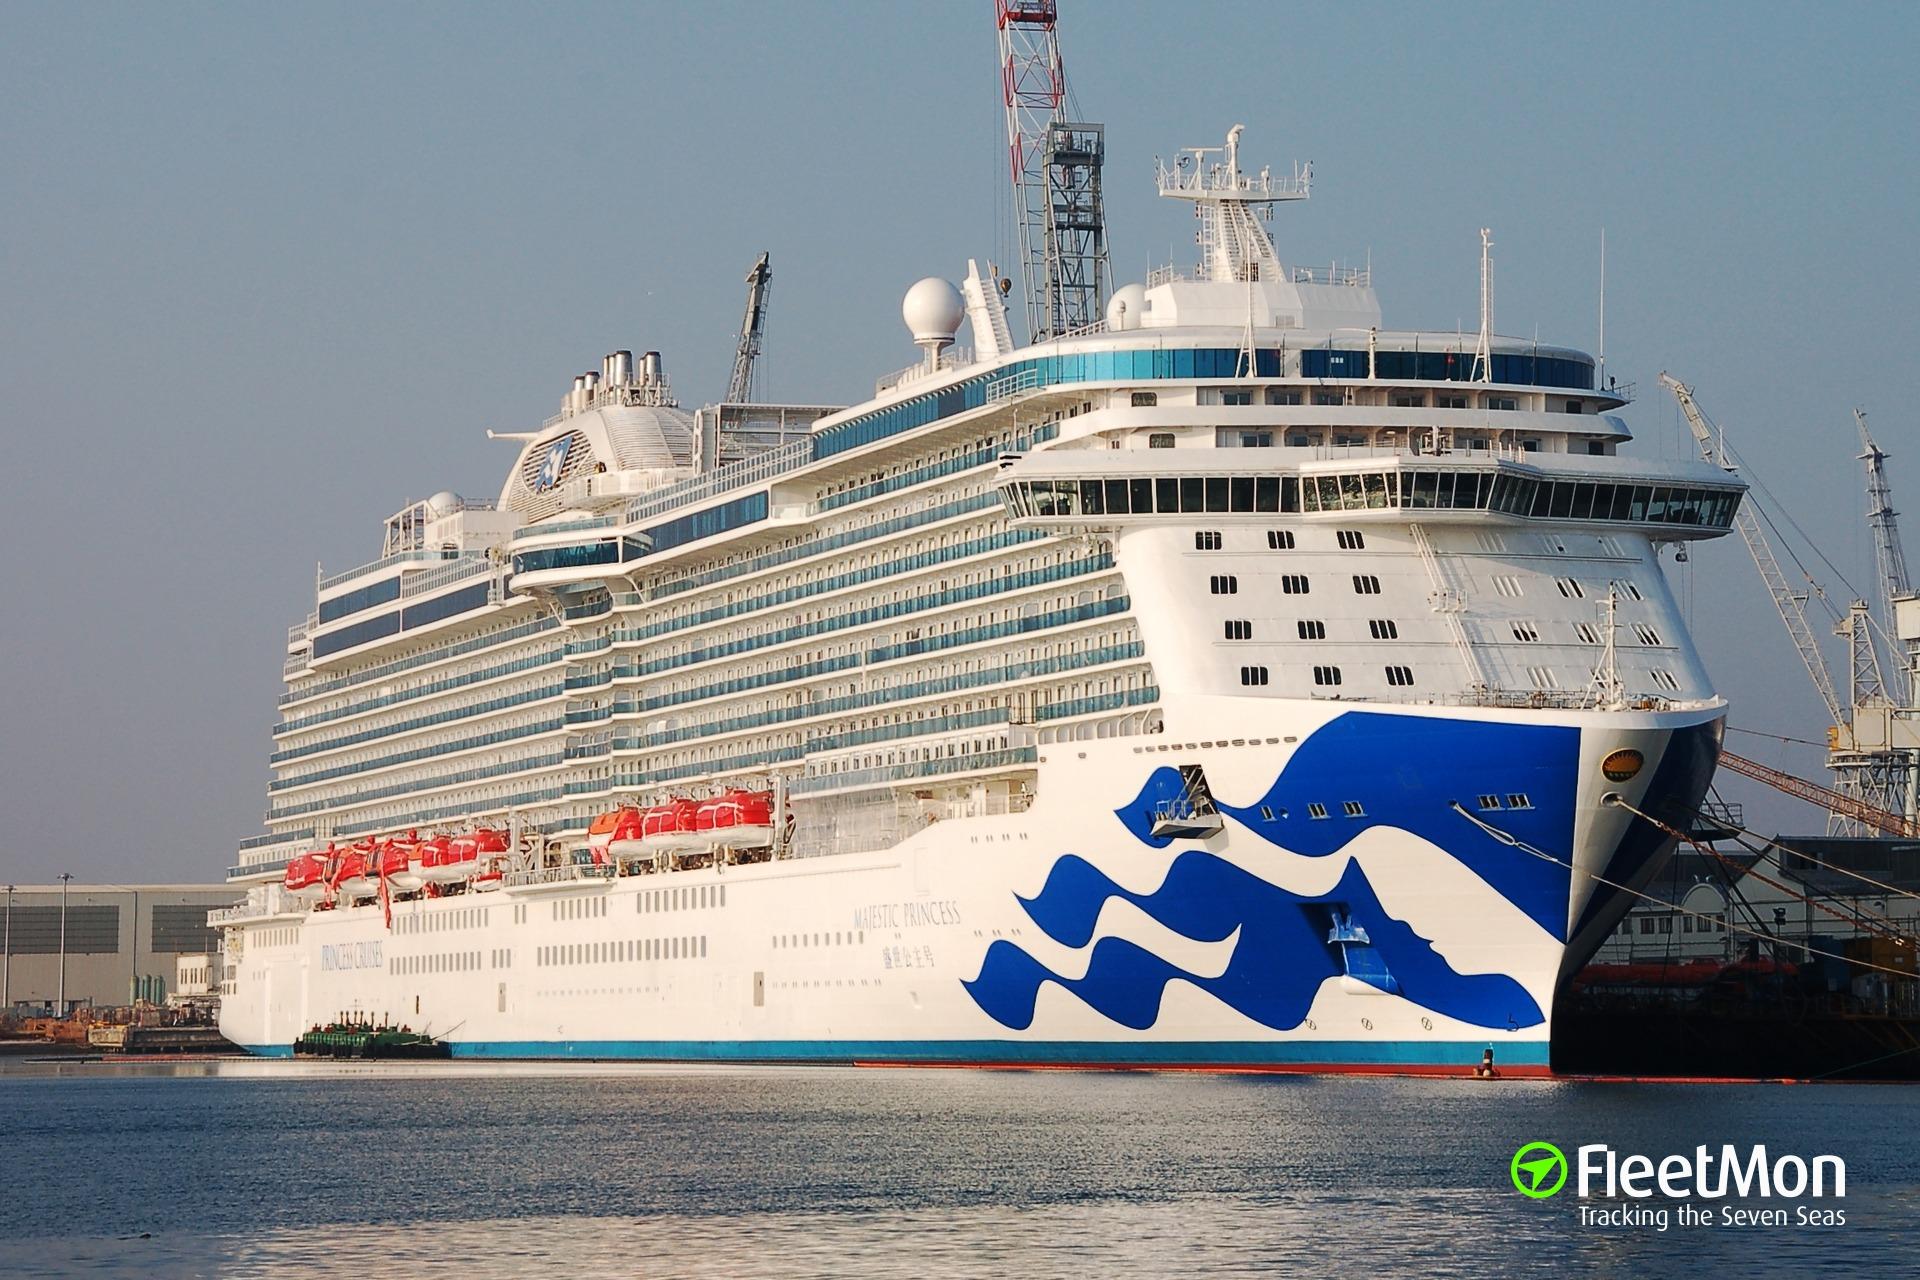 Majestic Princess Passenger Ship Imo 9614141